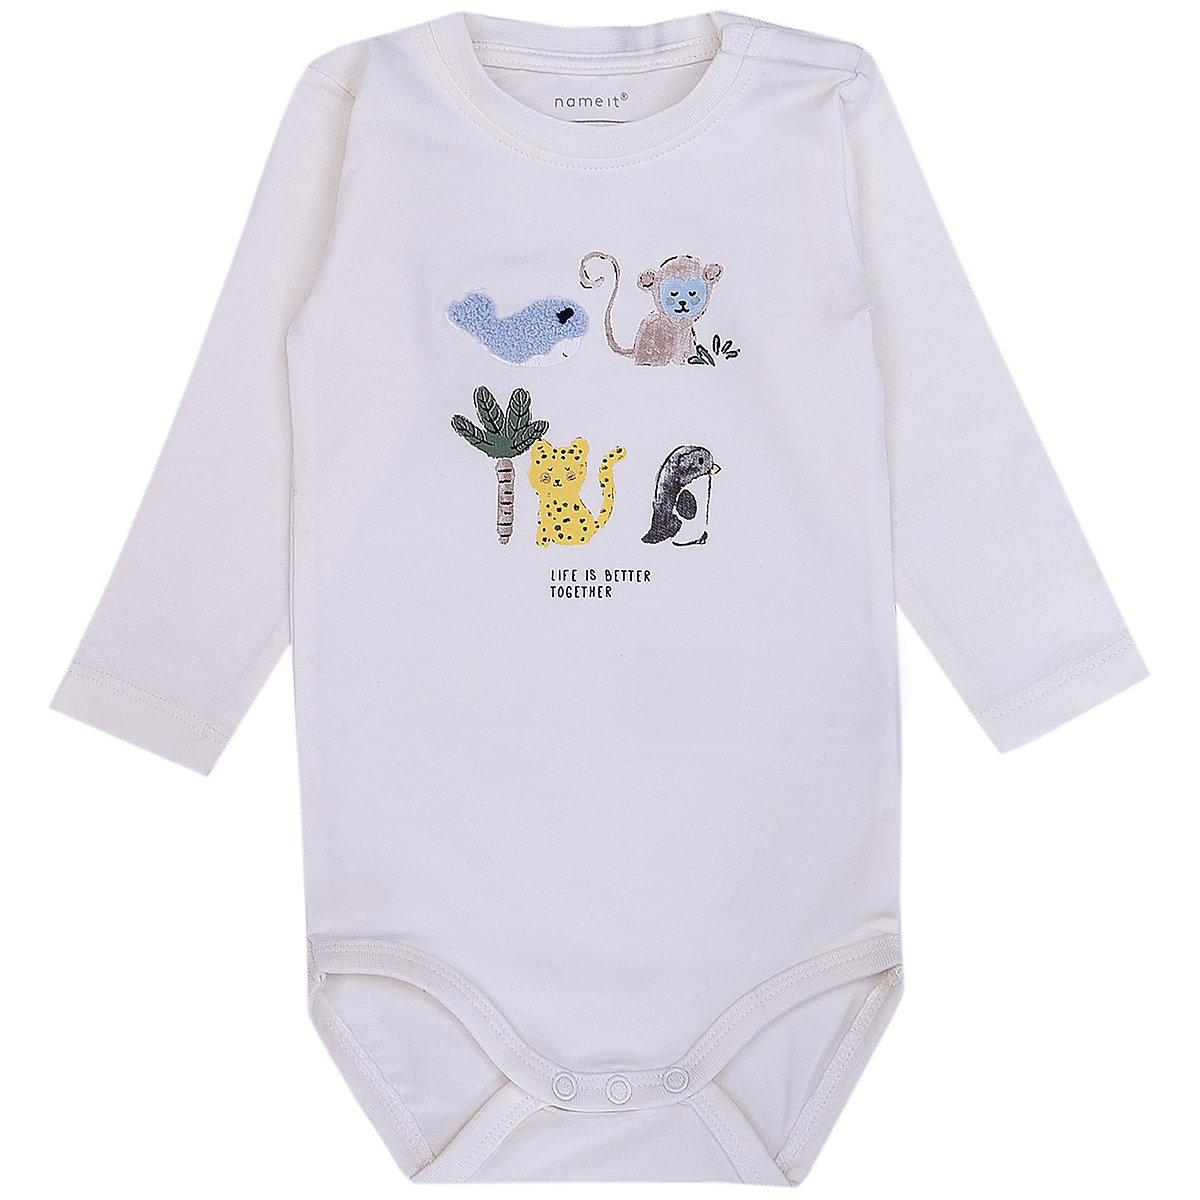 NAME IT Bodysuits 10626671 baby clothing bodysuit for boys and girls цены онлайн